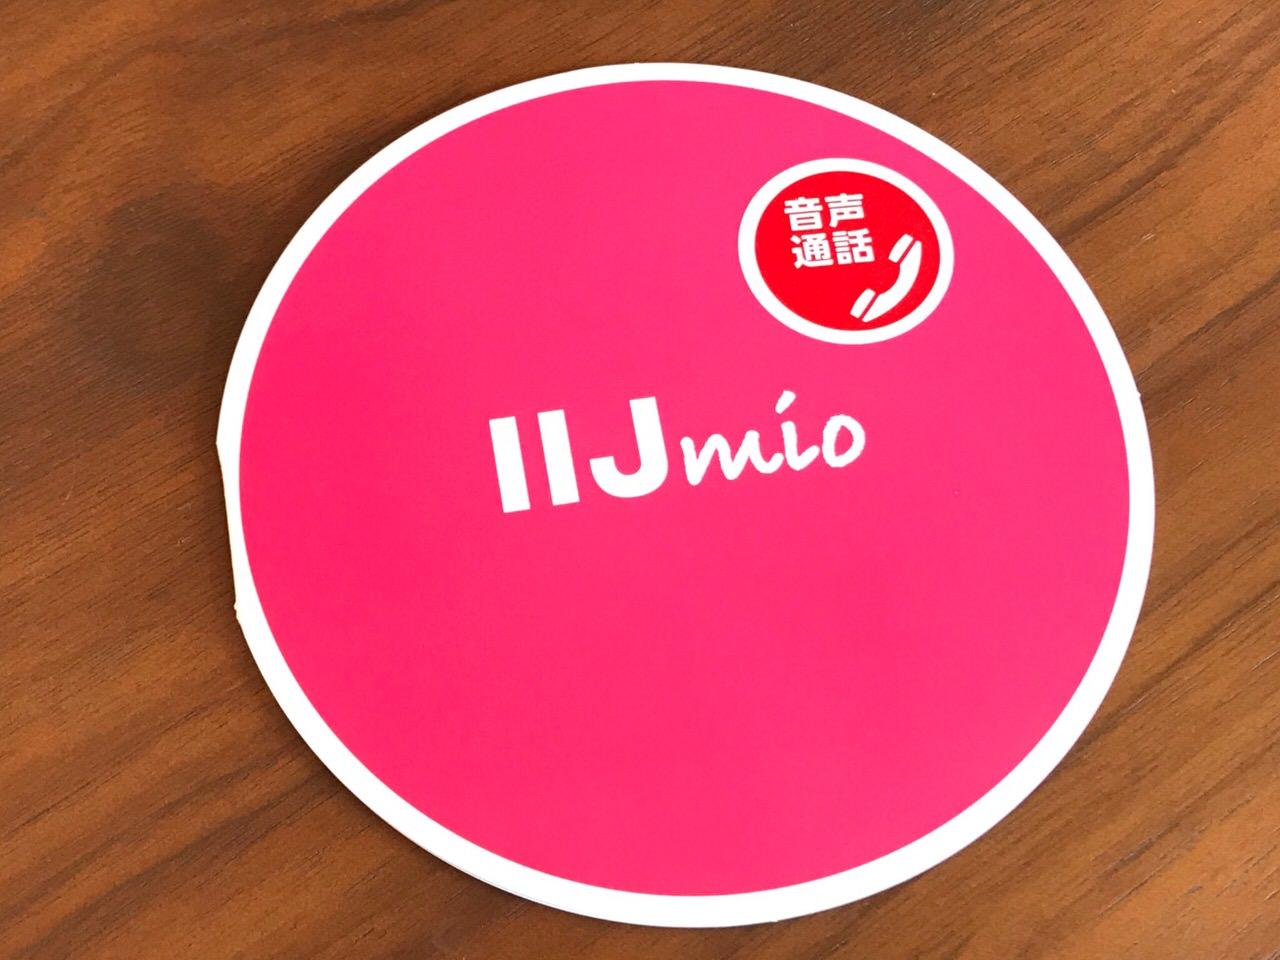 【IIJmio】SIM再発行の手続きから届くまで